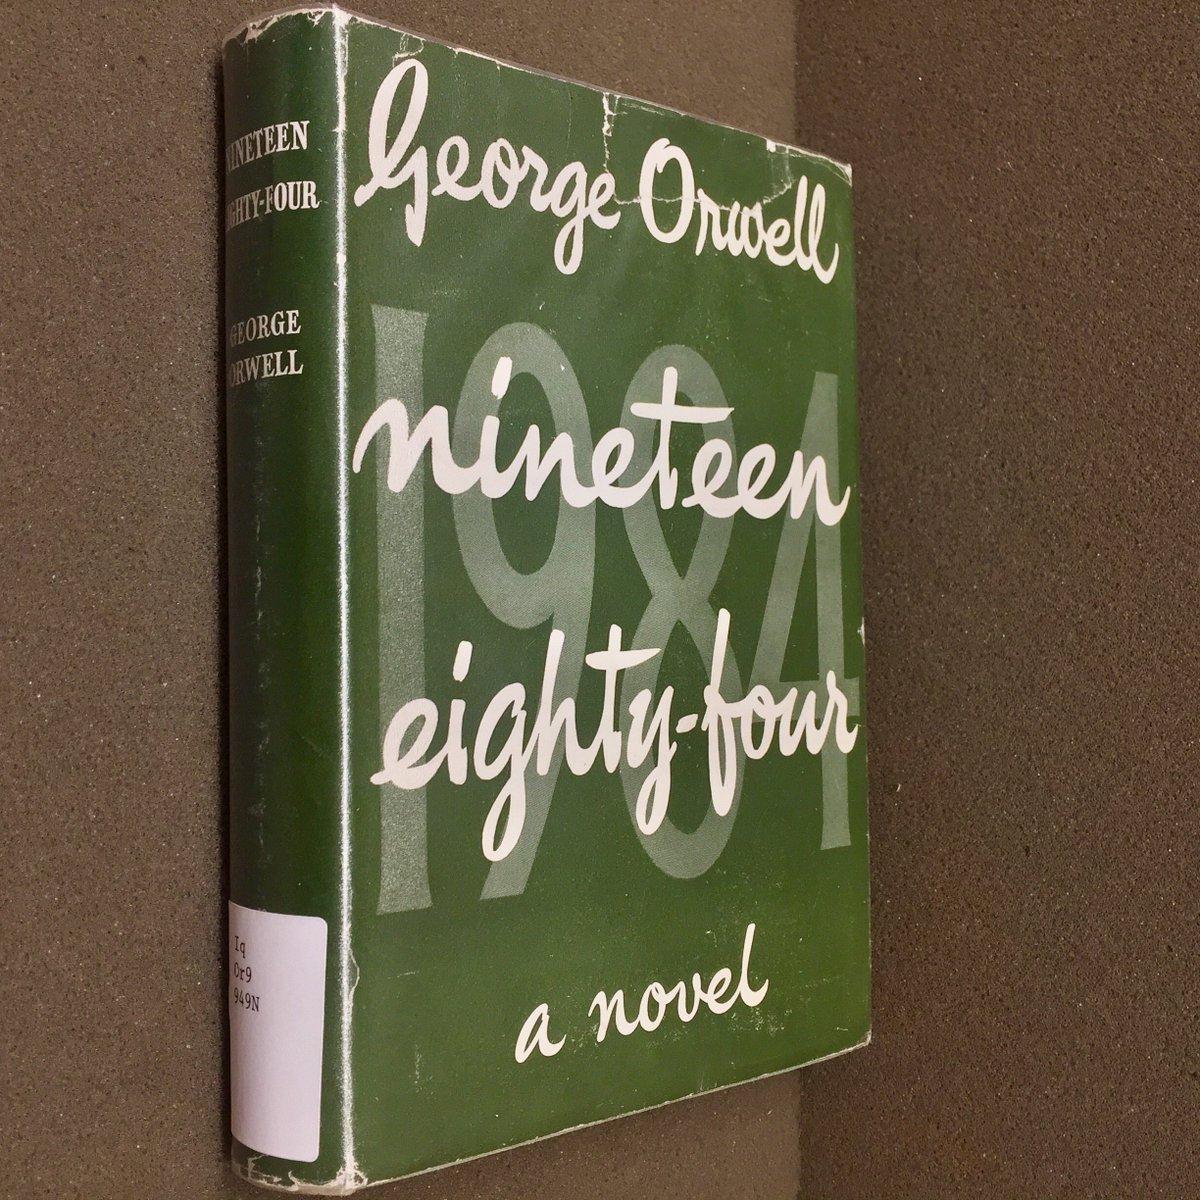 George Orwell: Nineteen eighty-four, a novel. bit.ly/2tsJZYW